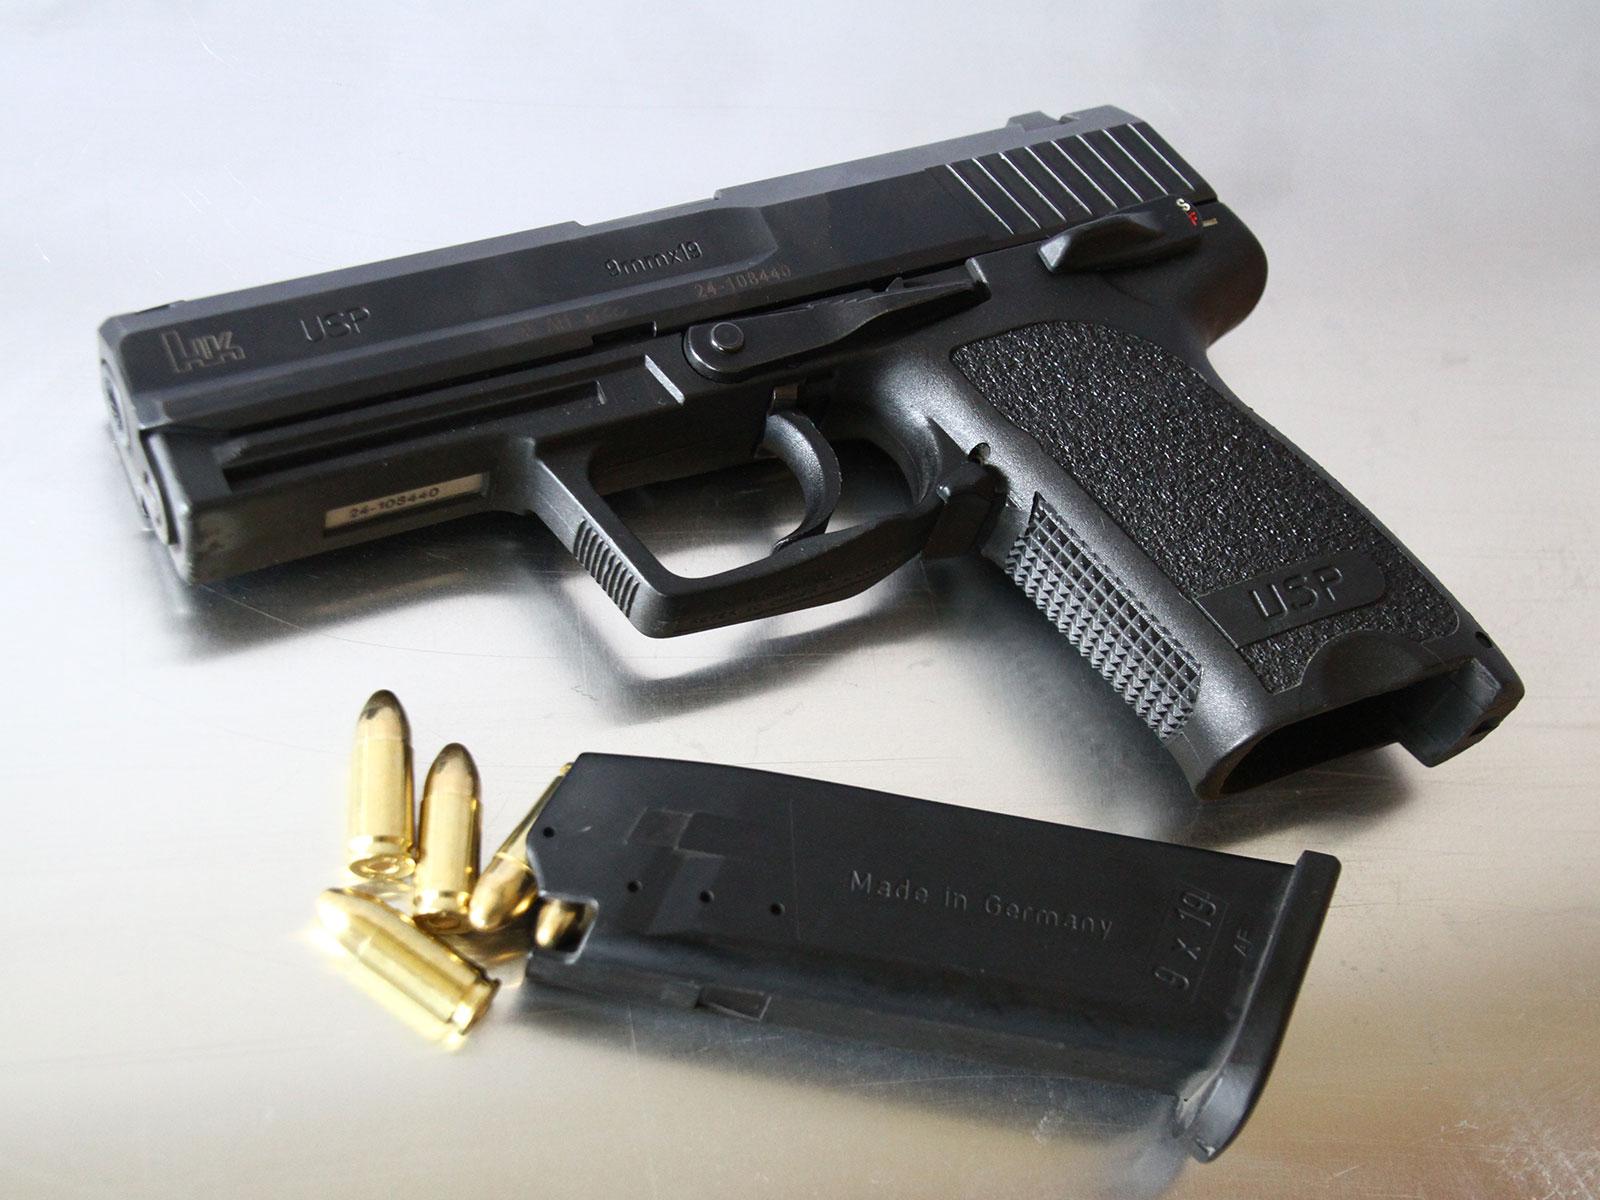 SH_Web_Wir_Waffen_HK-USP-1_1800x1200